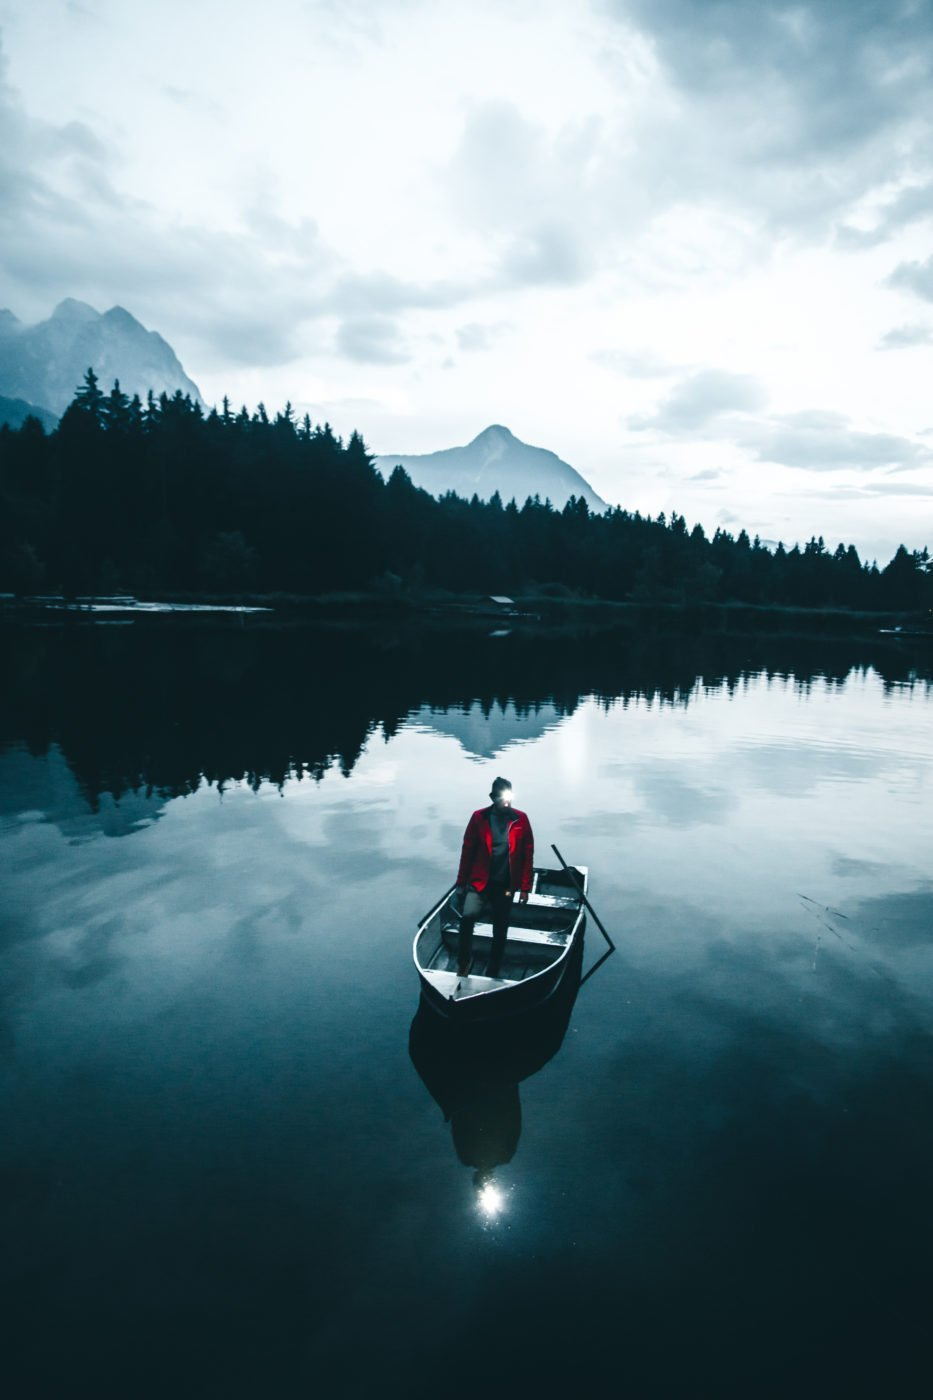 Lago di Fie, famous Instagram location in the Dolomites